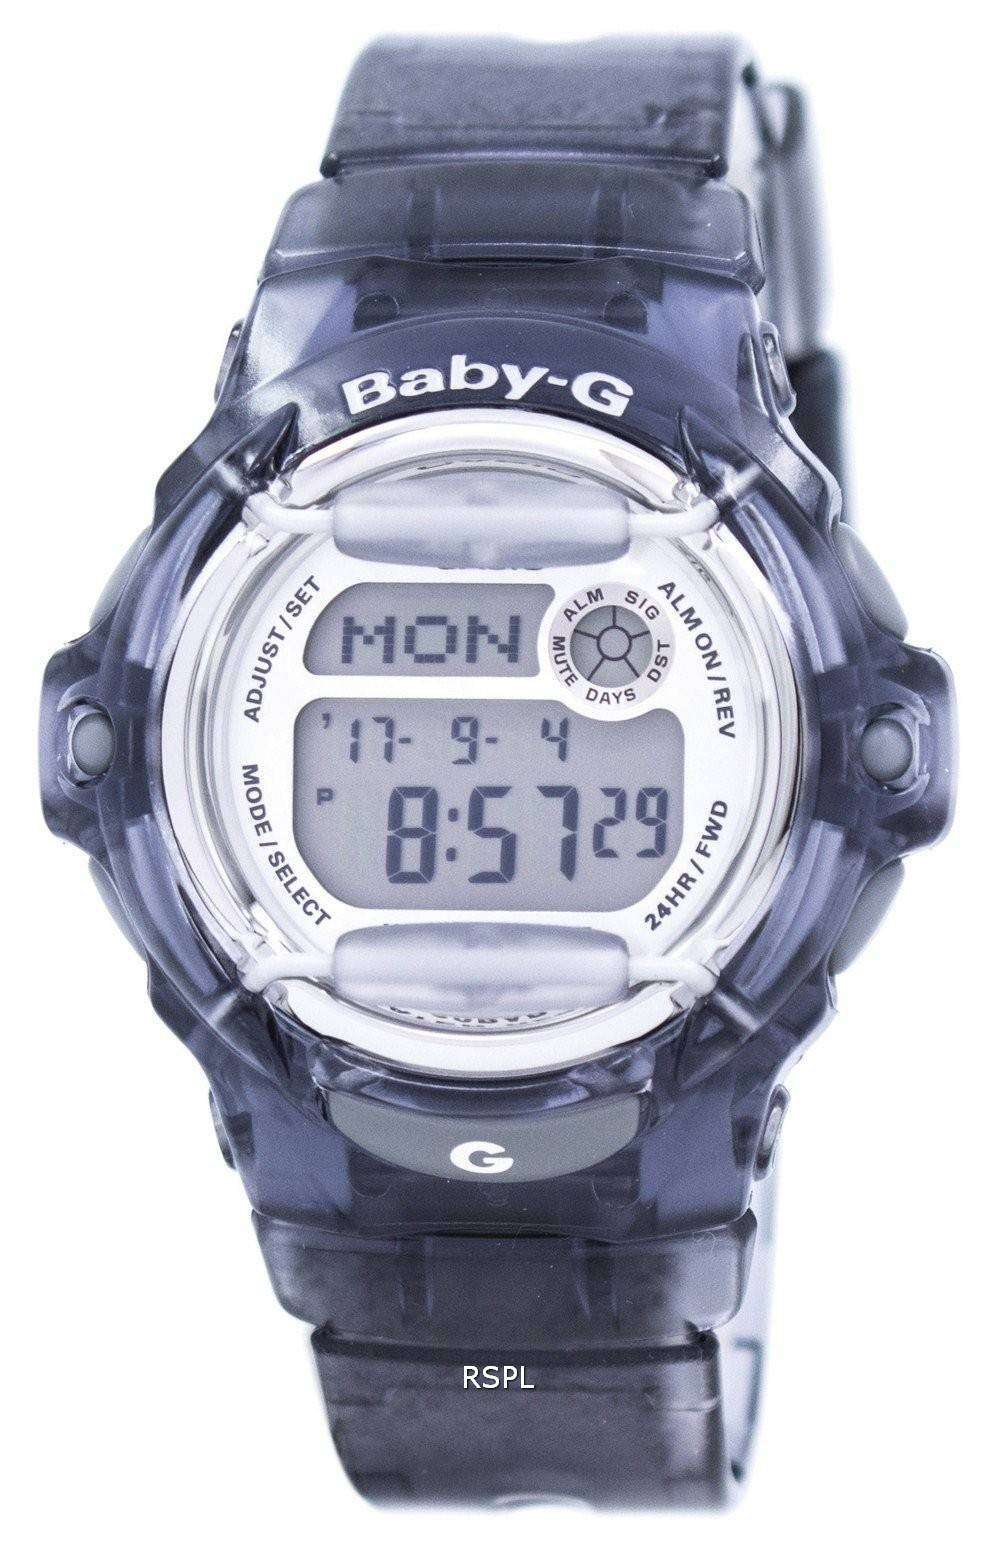 2e09855d9a01 Reloj Casio Baby-g mundo tiempo BG-169R - 8D femenina - citywatches.es